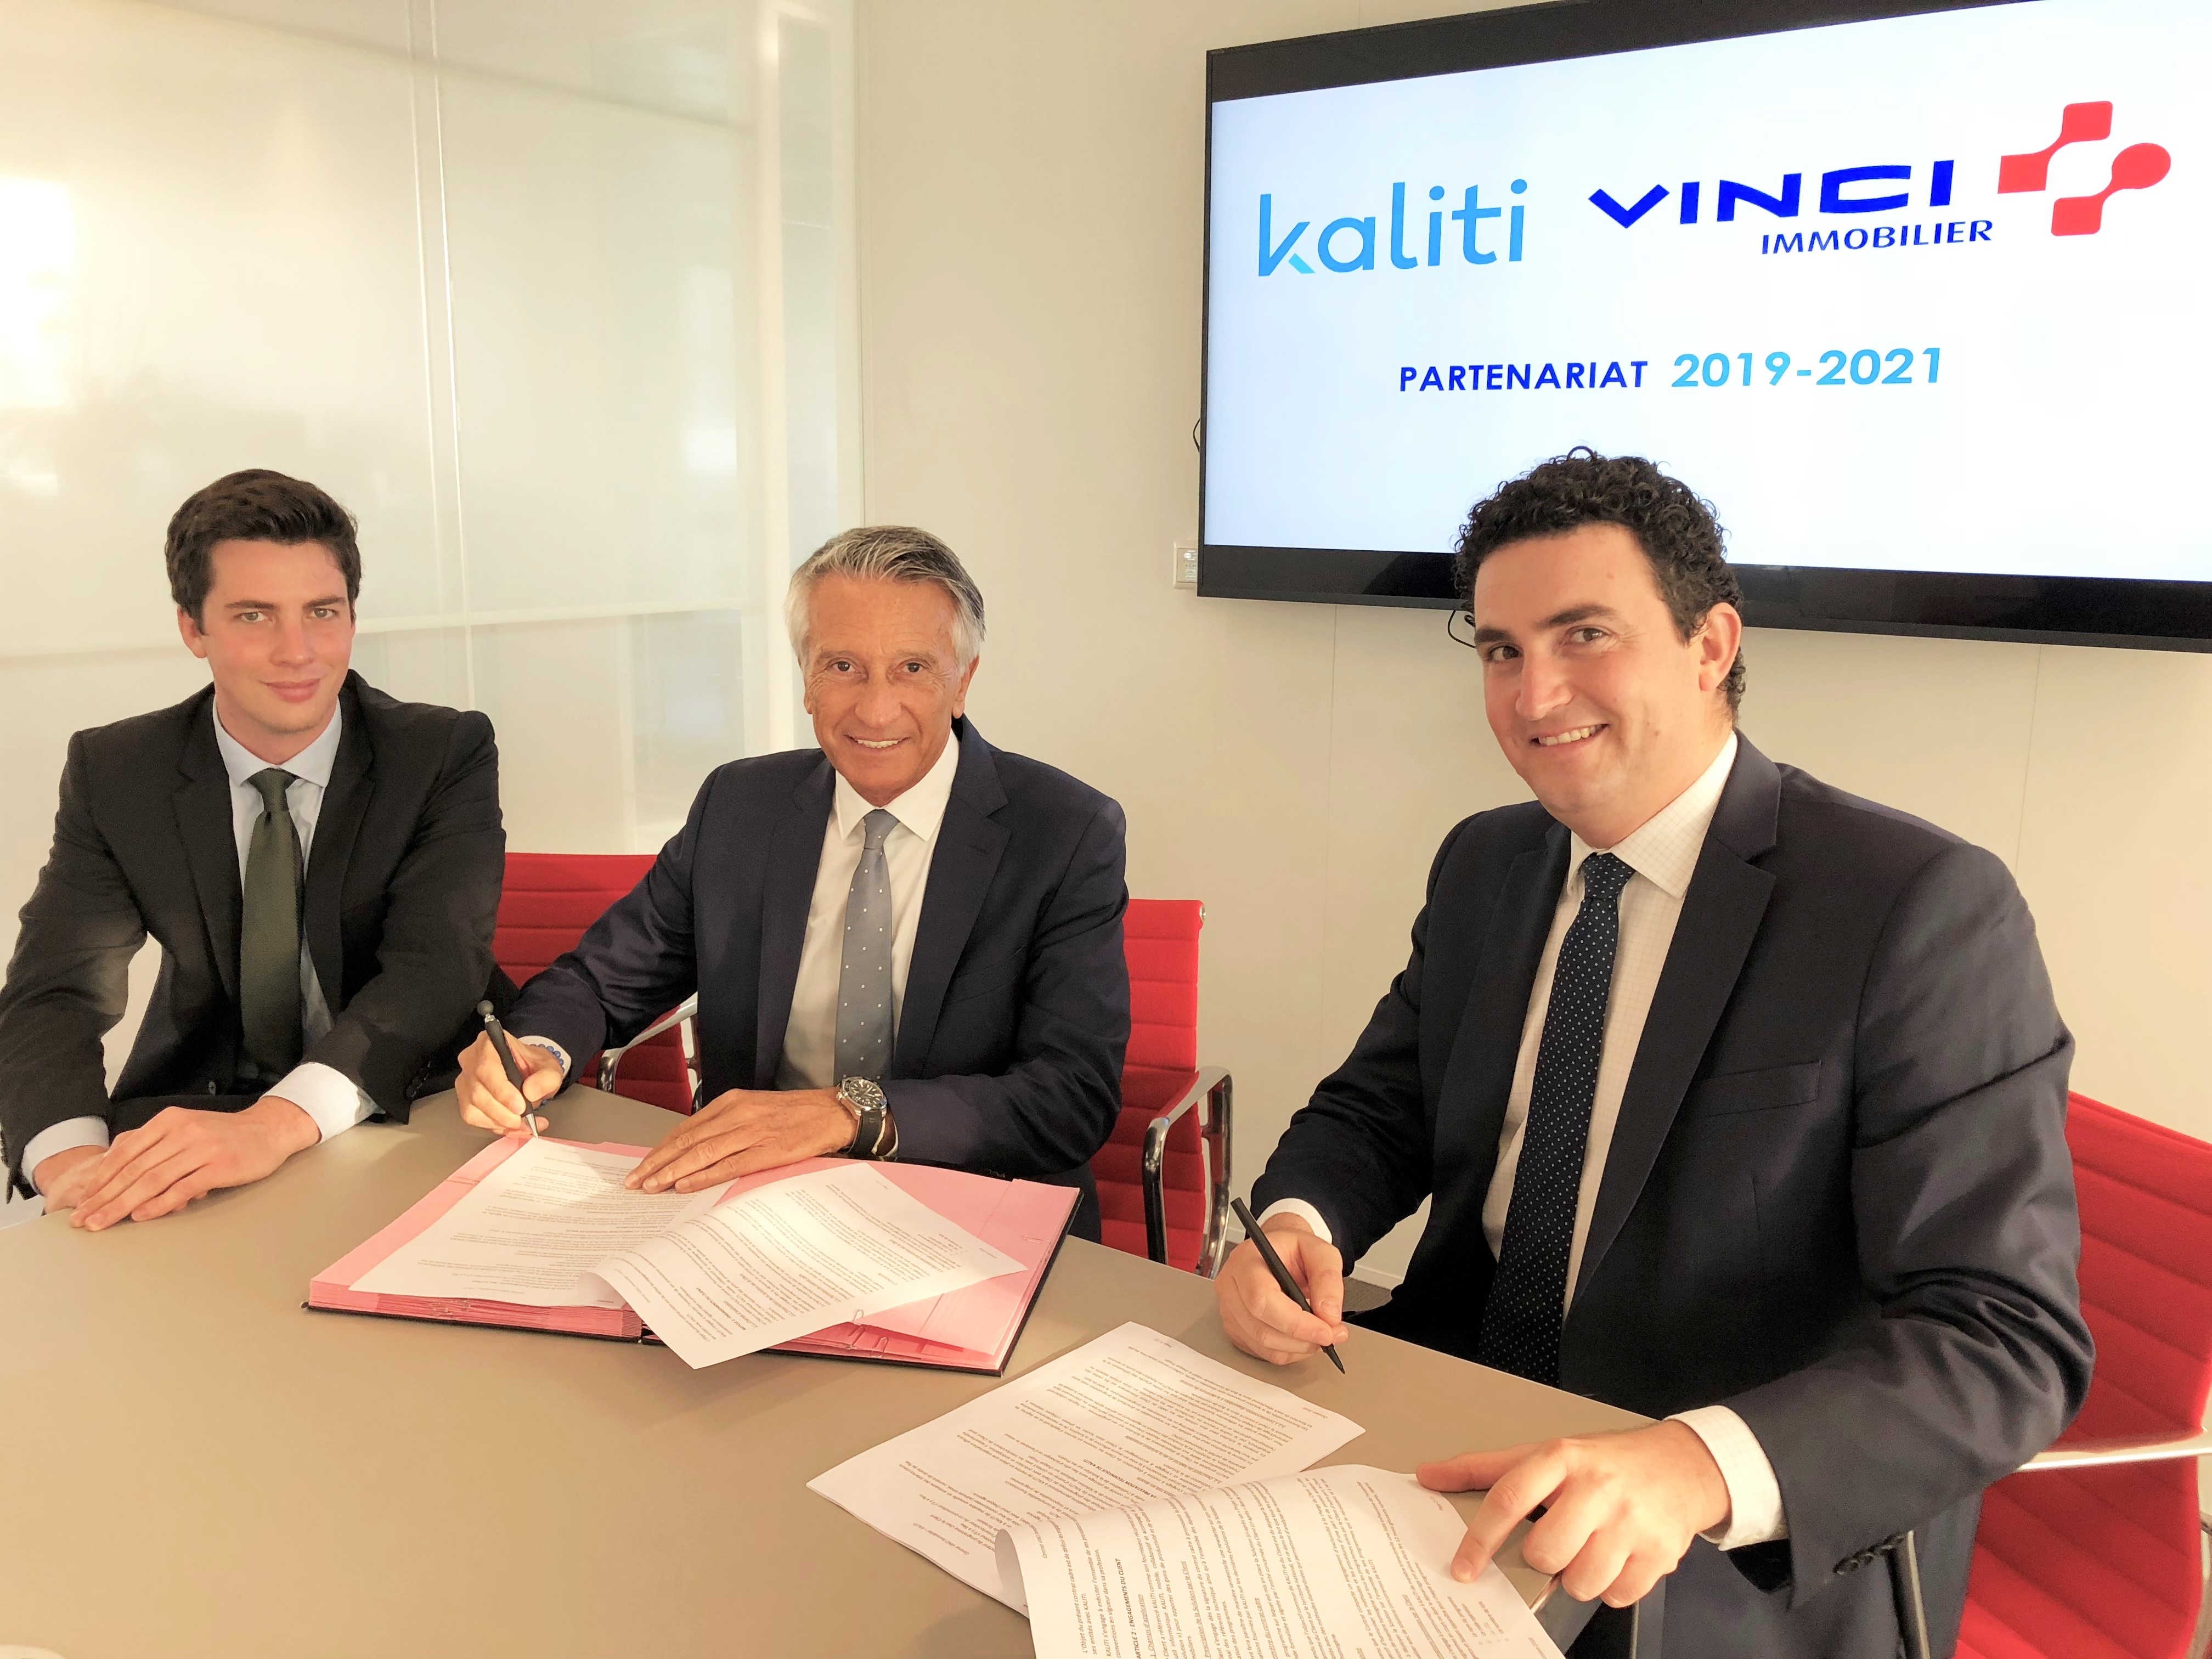 Signature Vinci Immobilier Kaliti